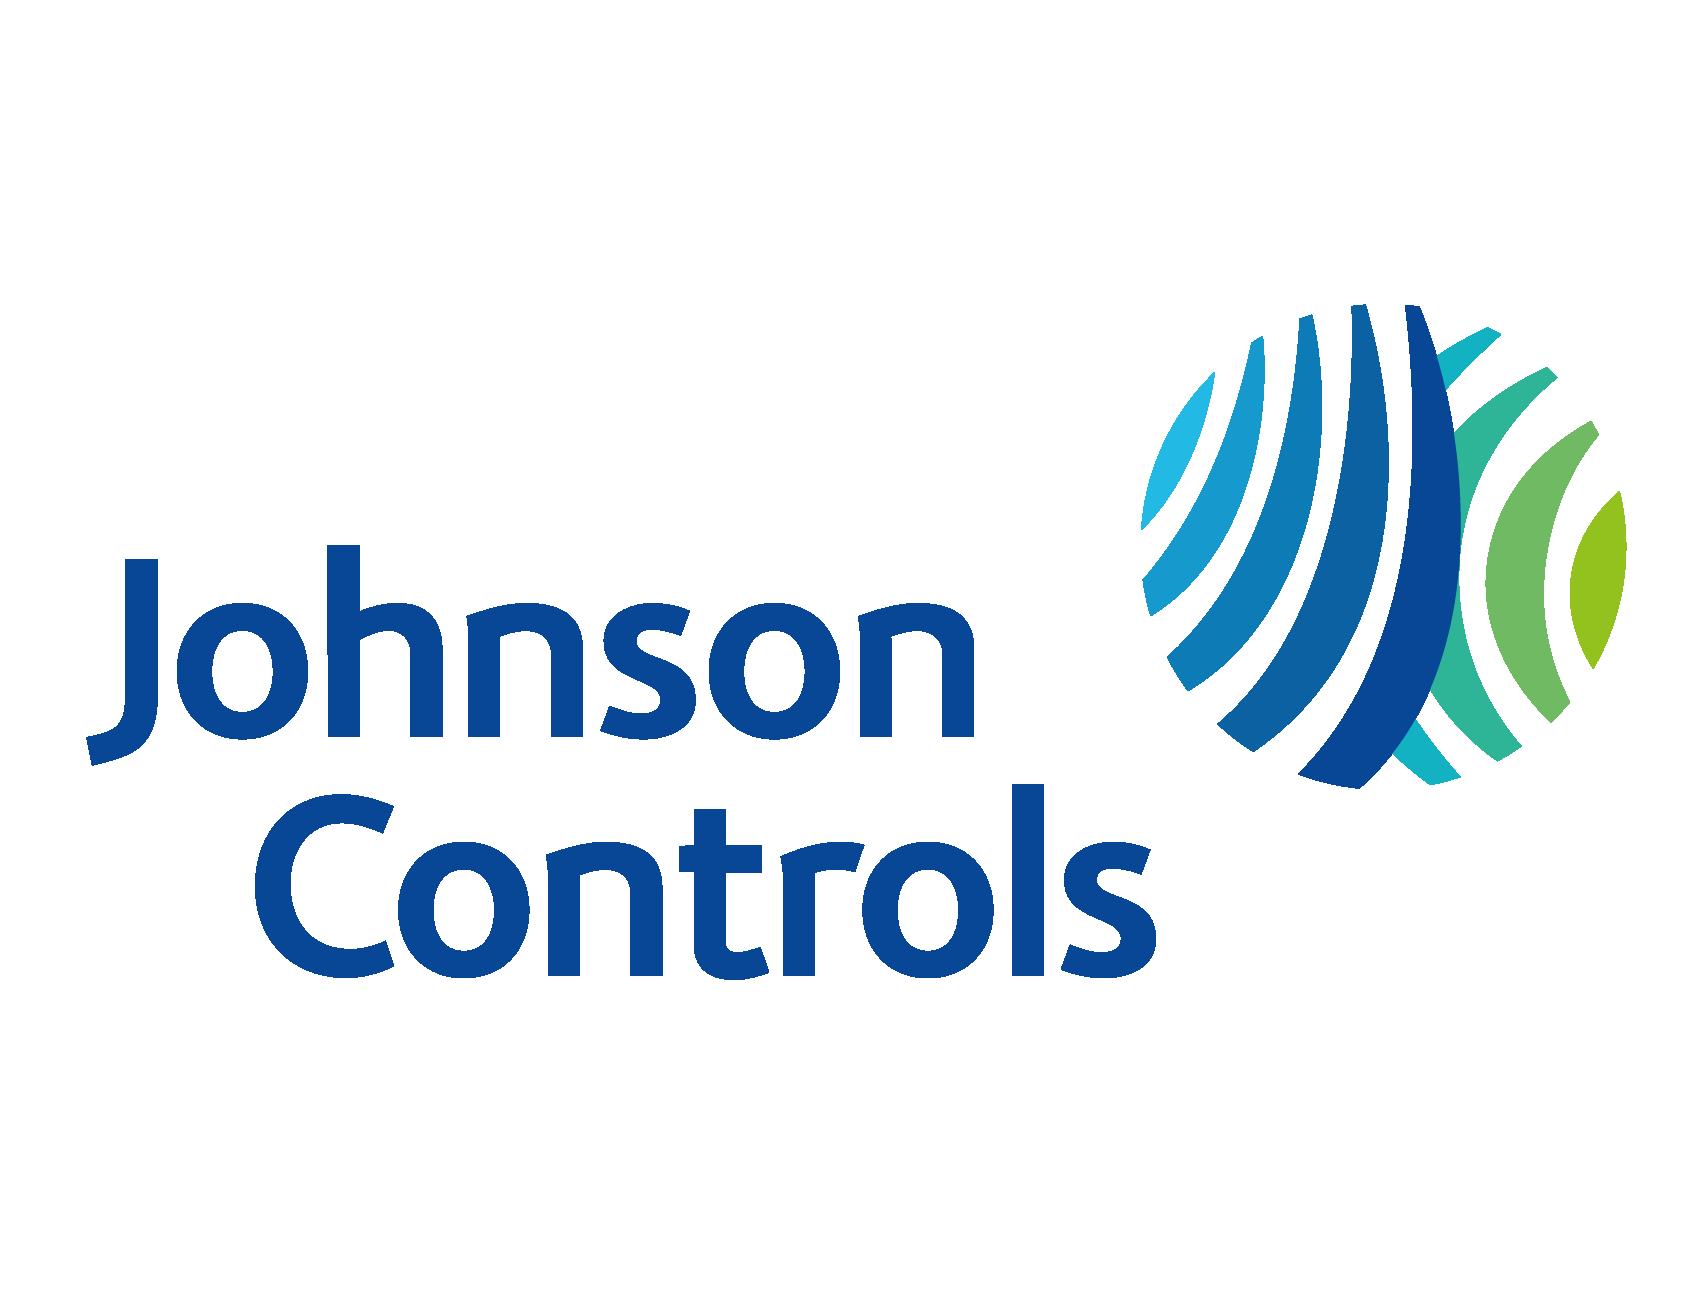 Johnson_Controls-01